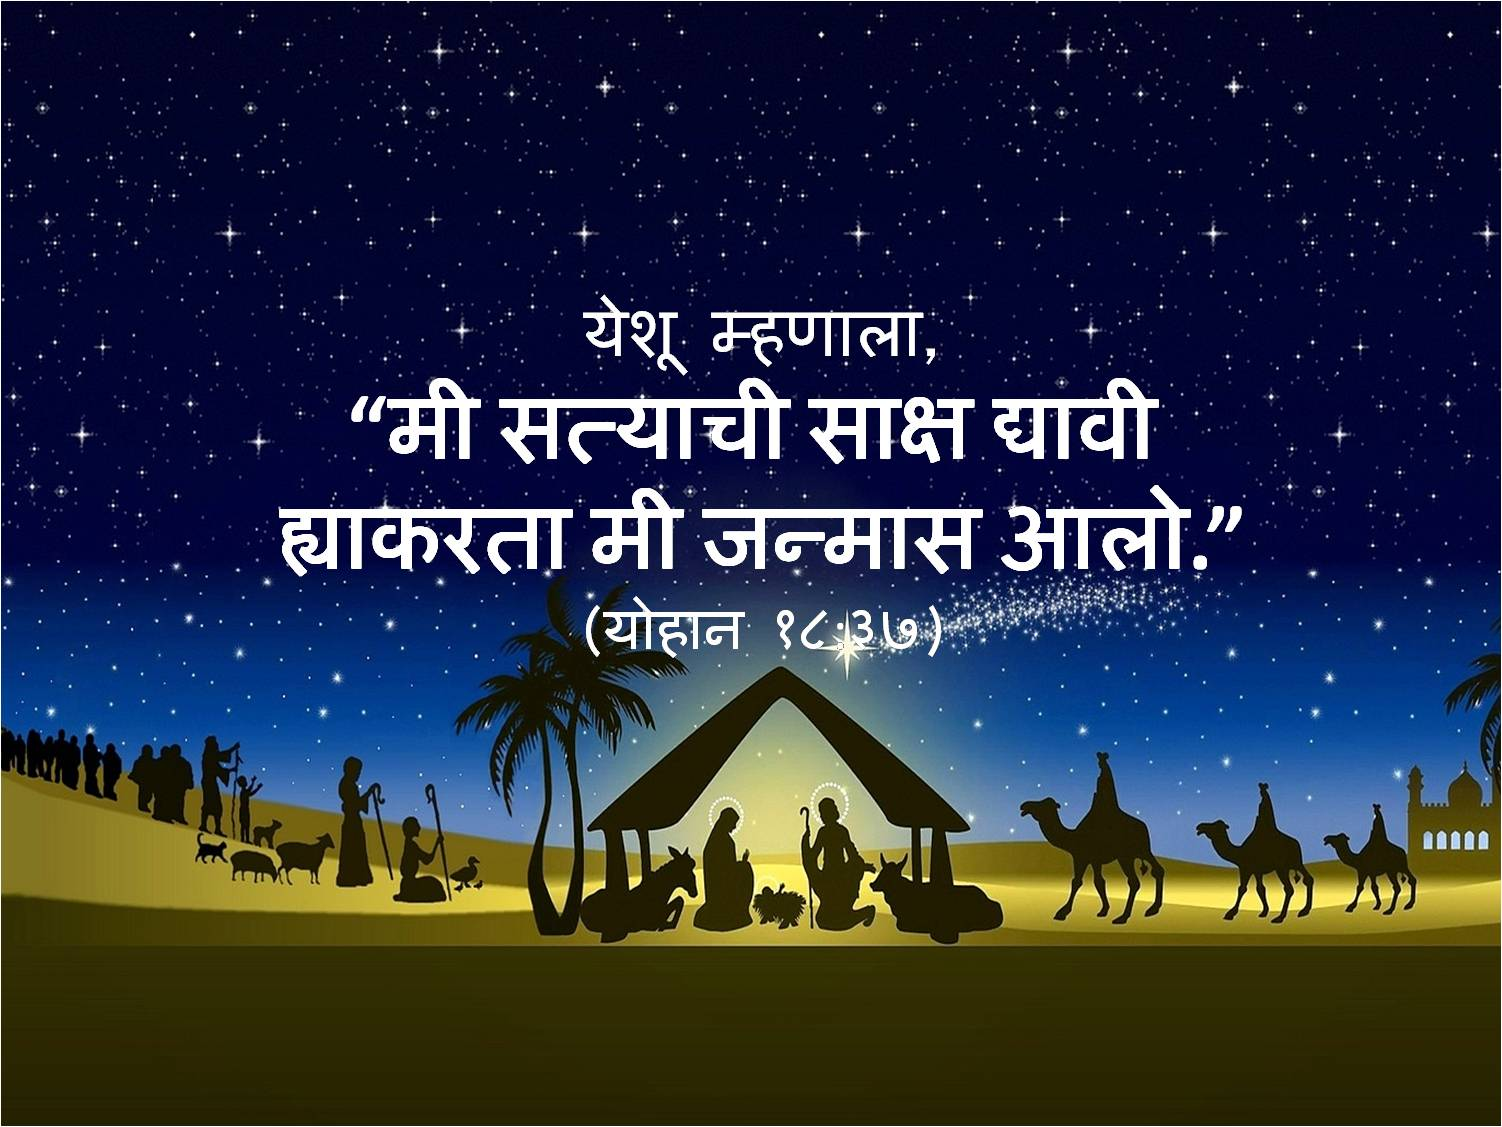 marathi bible wallpaper for - photo #17